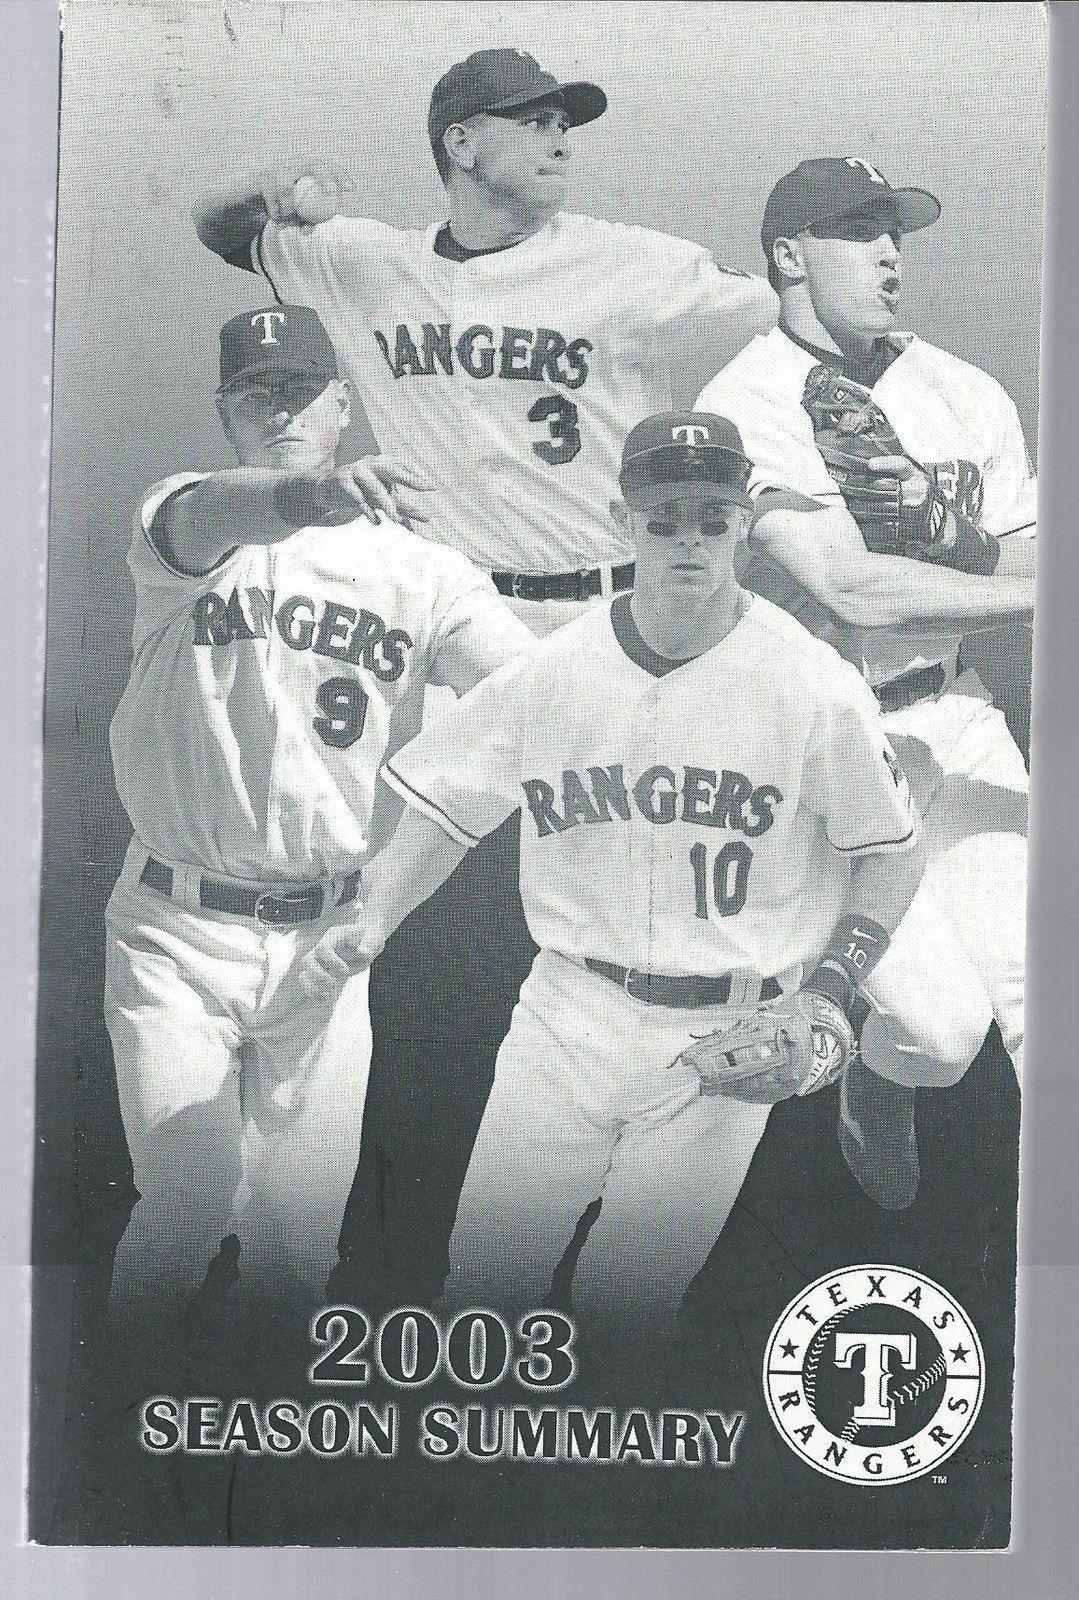 2003 Texas Rangers Baseball MLB Media Guide -  Post Season Summary Player Info